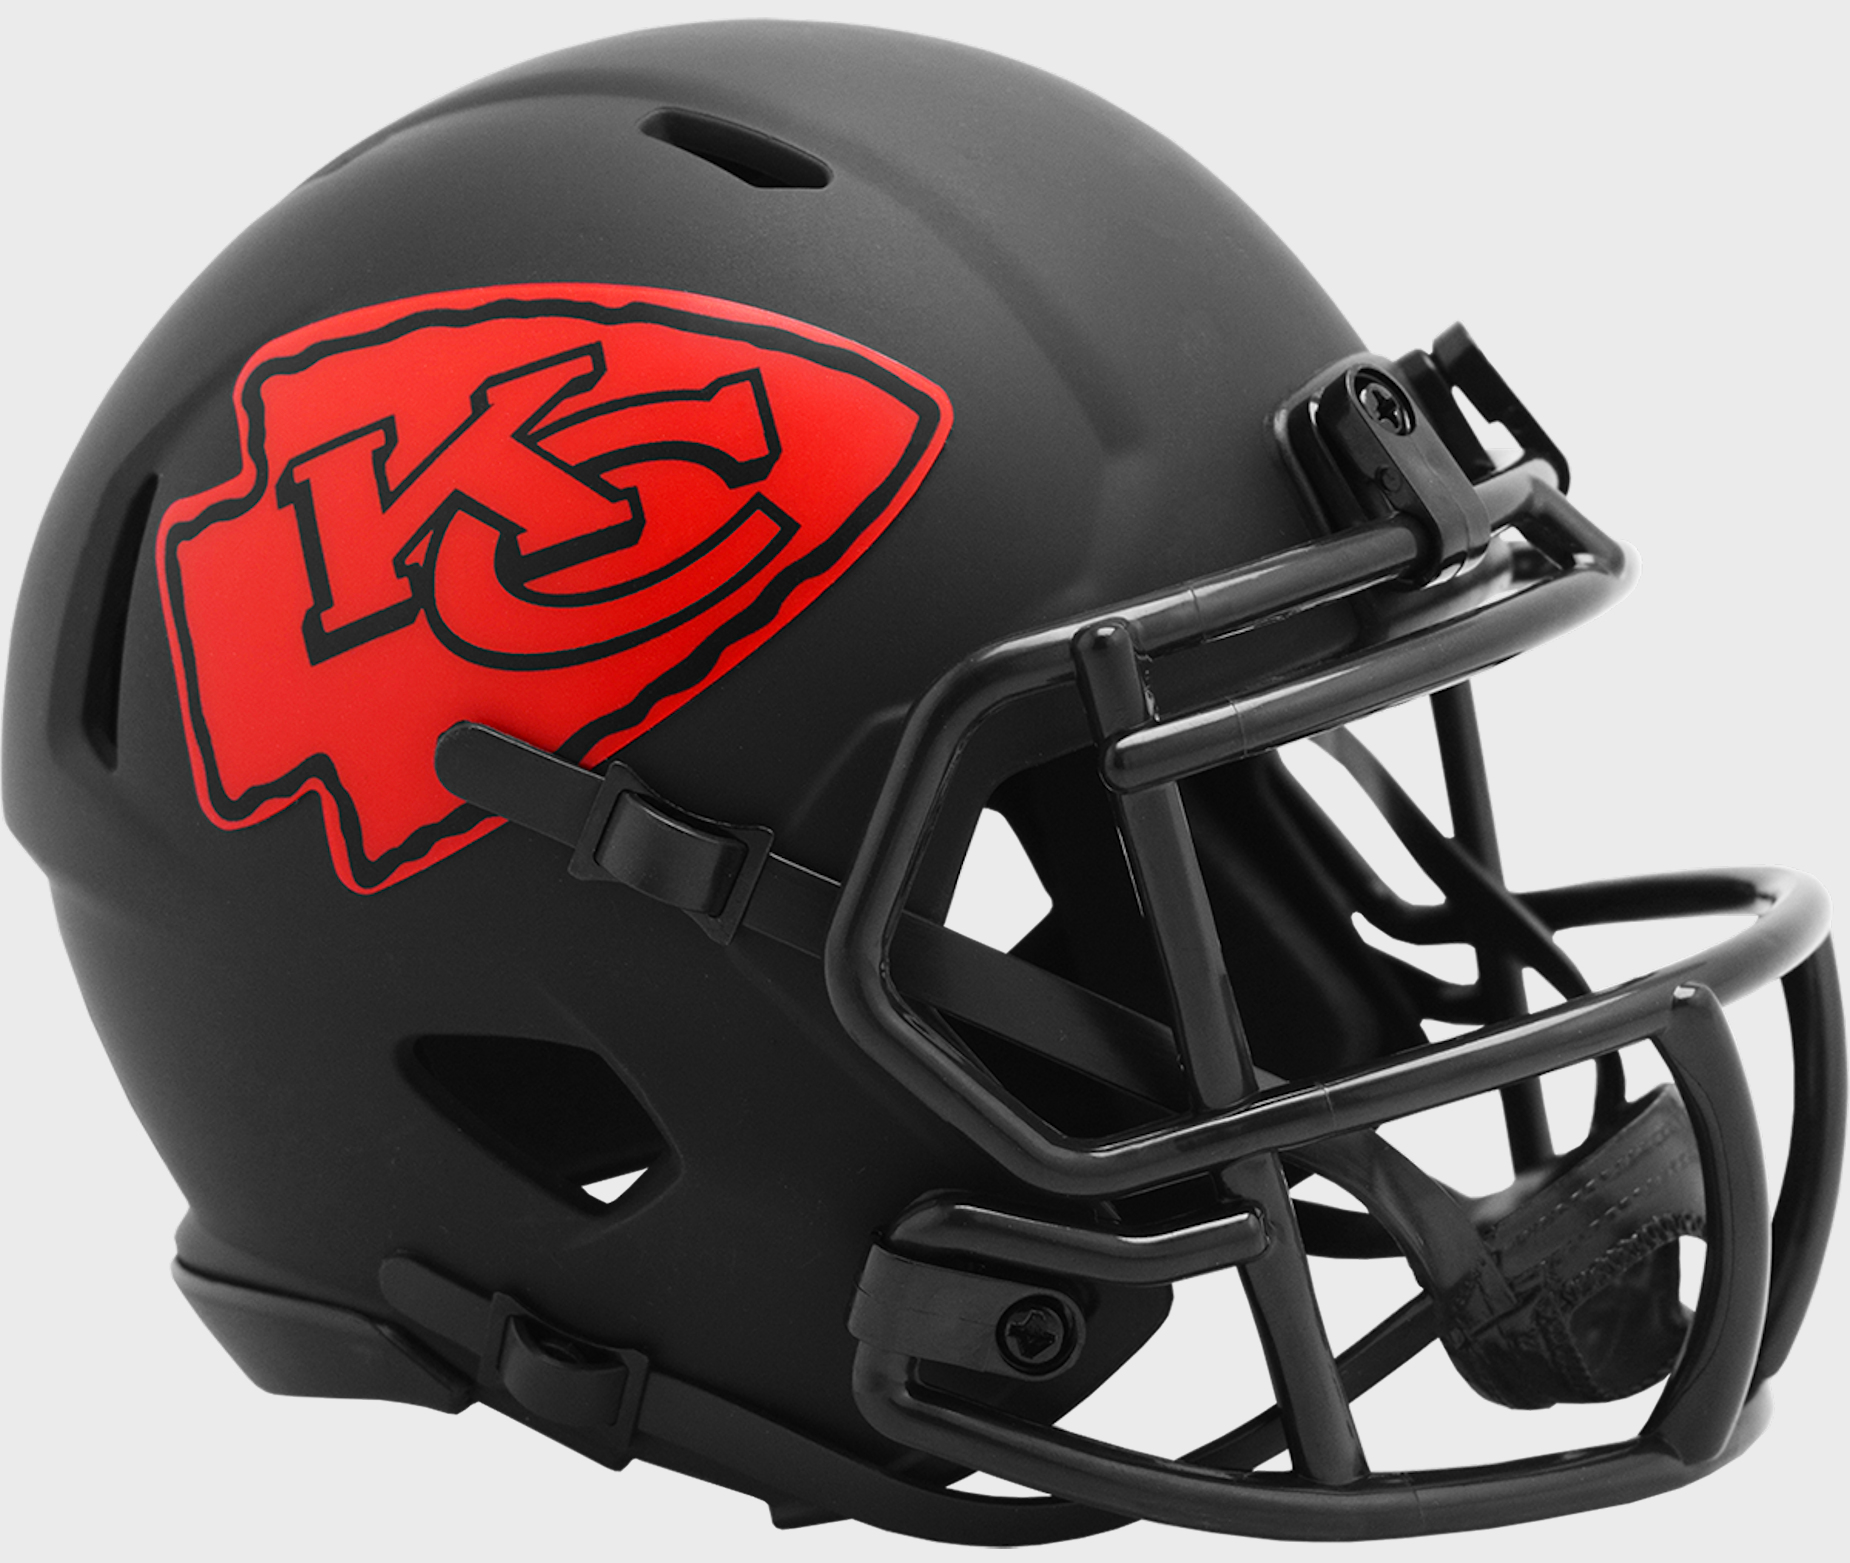 Kansas City Chiefs NFL Mini Speed Football Helmet <B>ECLIPSE</B>